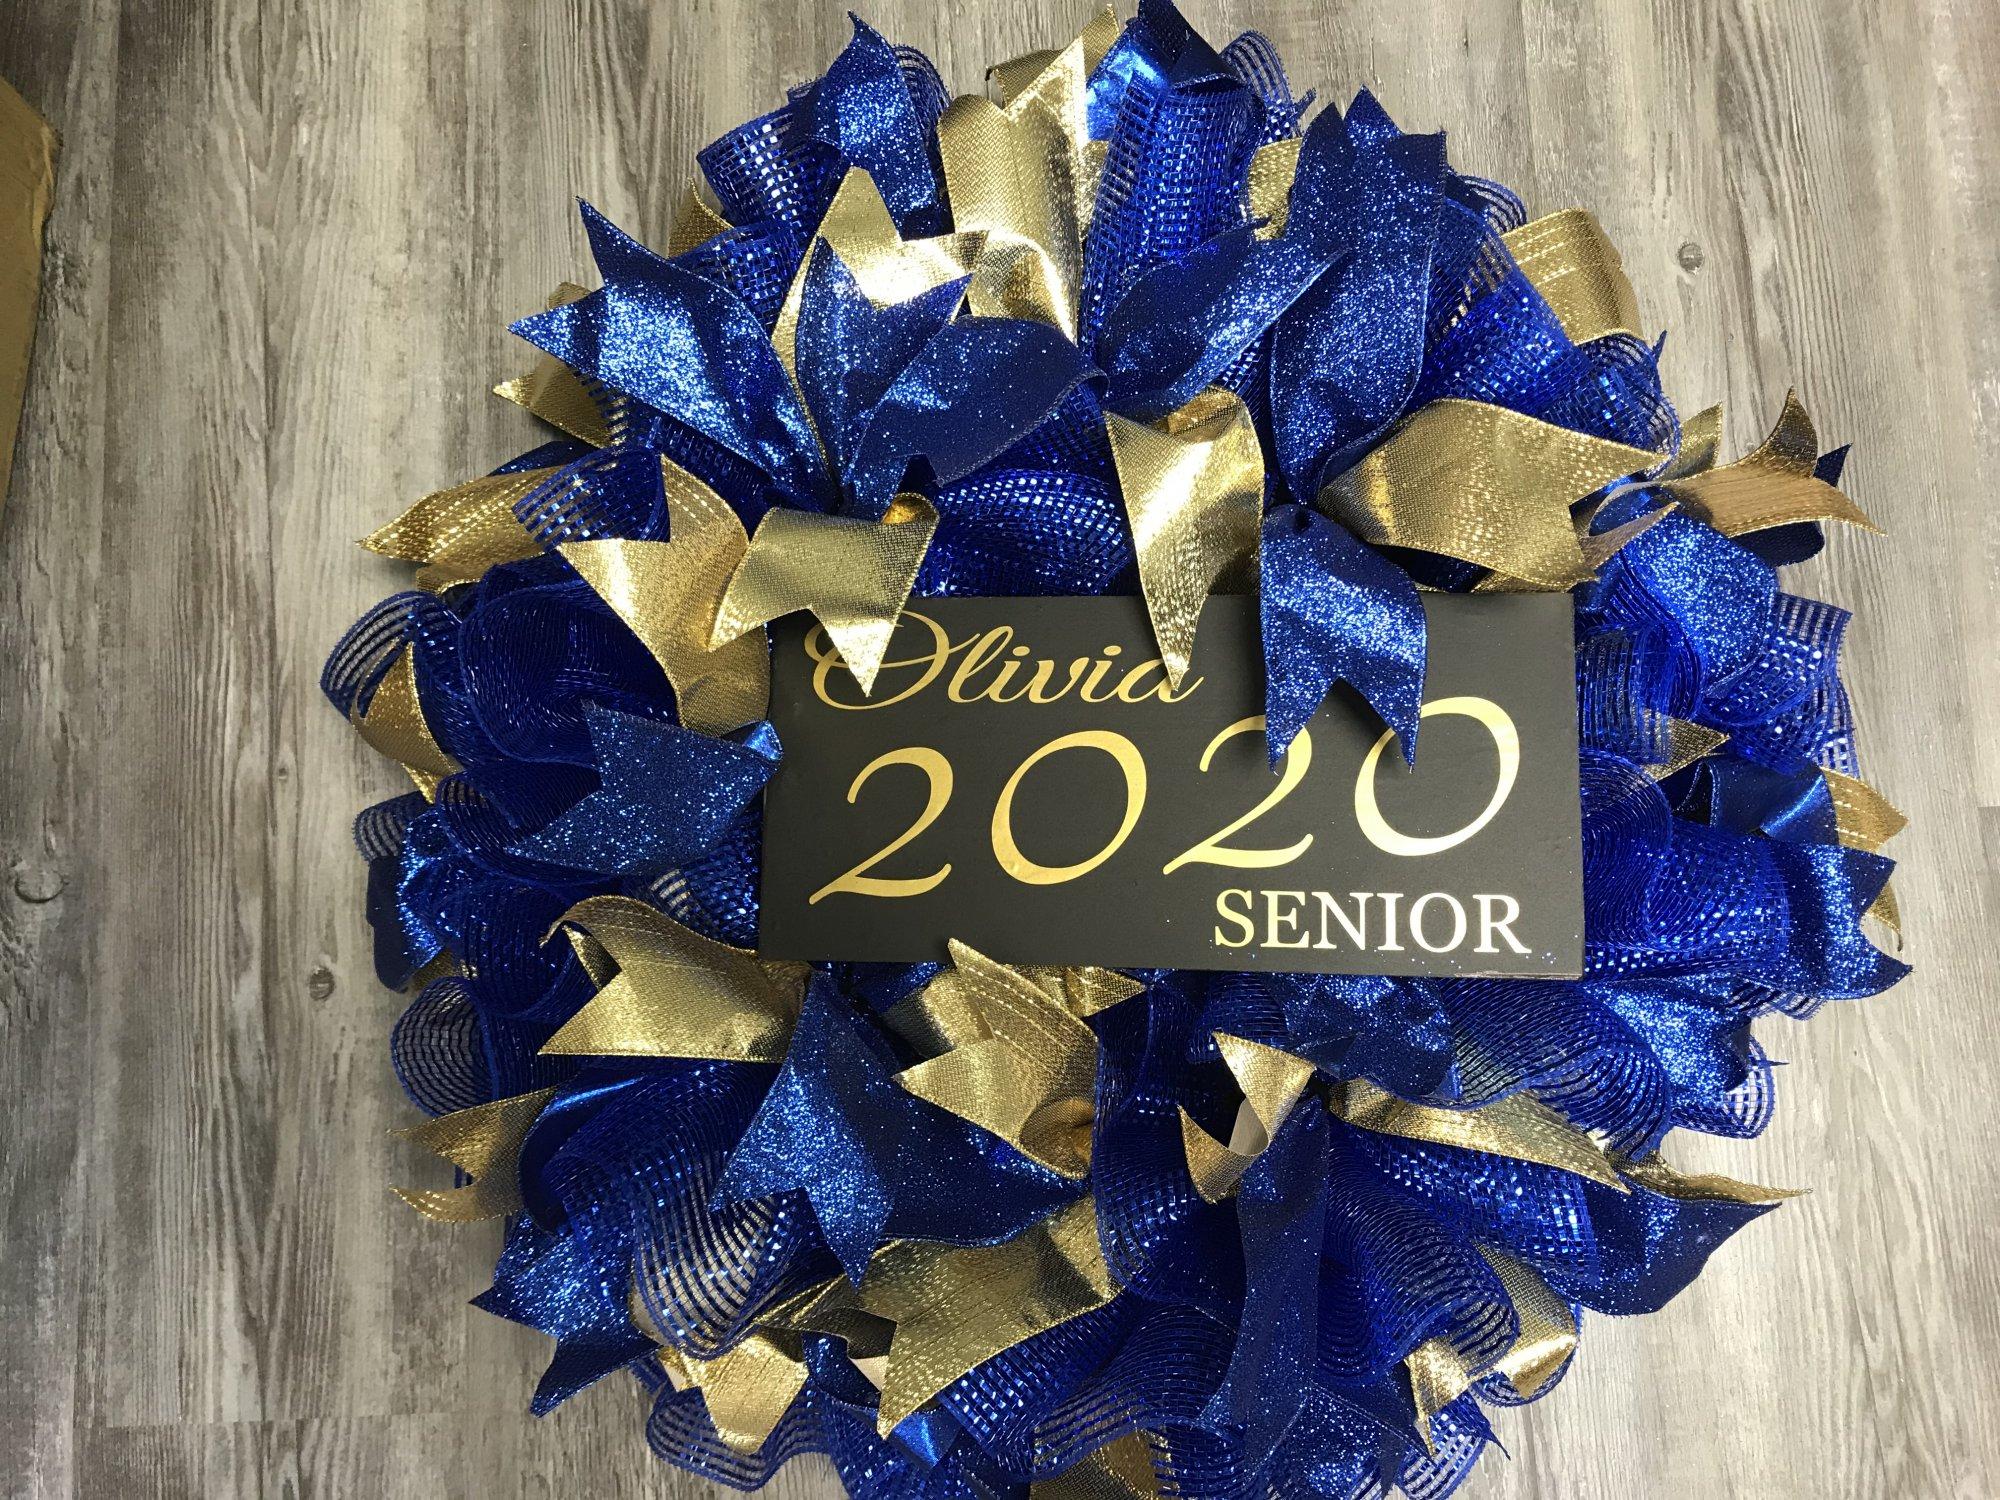 Personalized Senior Blue & Gold Wreath Kit